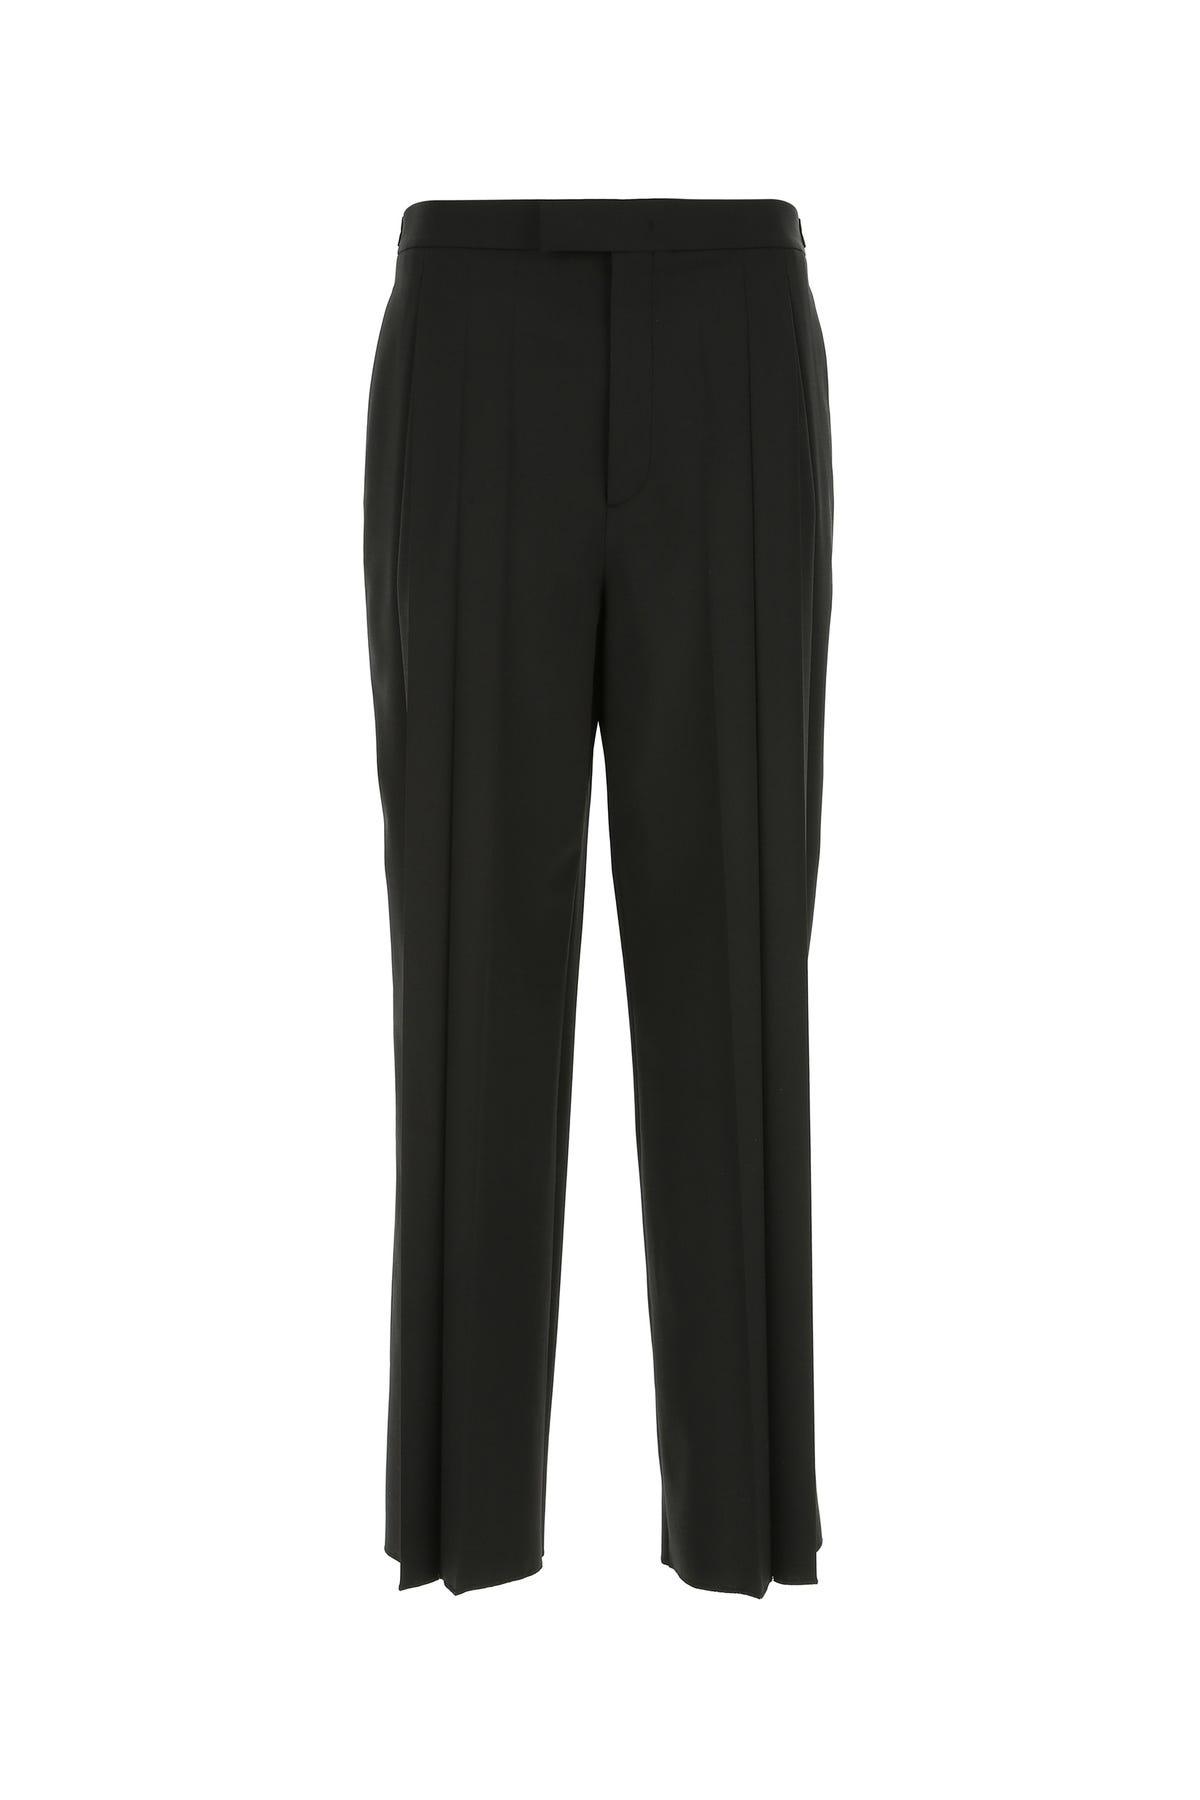 Valentino Black Stretch Polyester Blend Pant  Black  Uomo 50